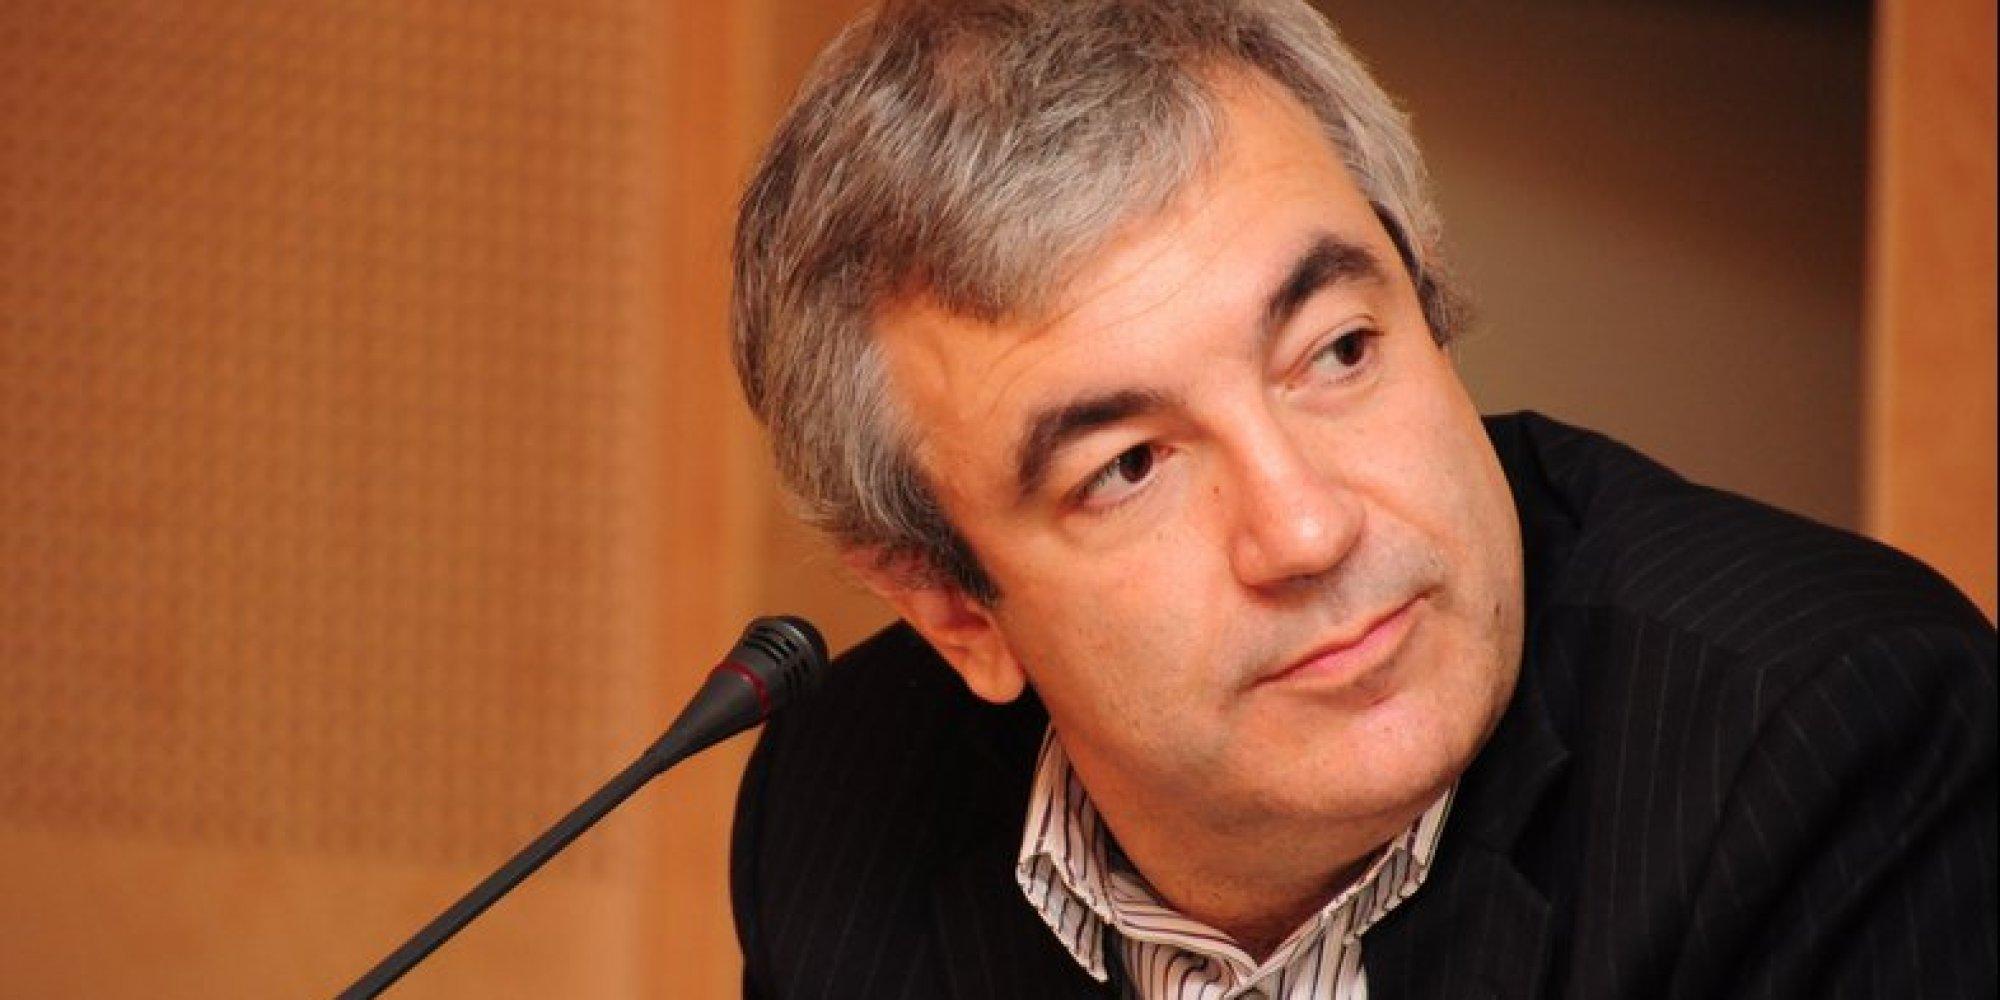 LuisGaricano